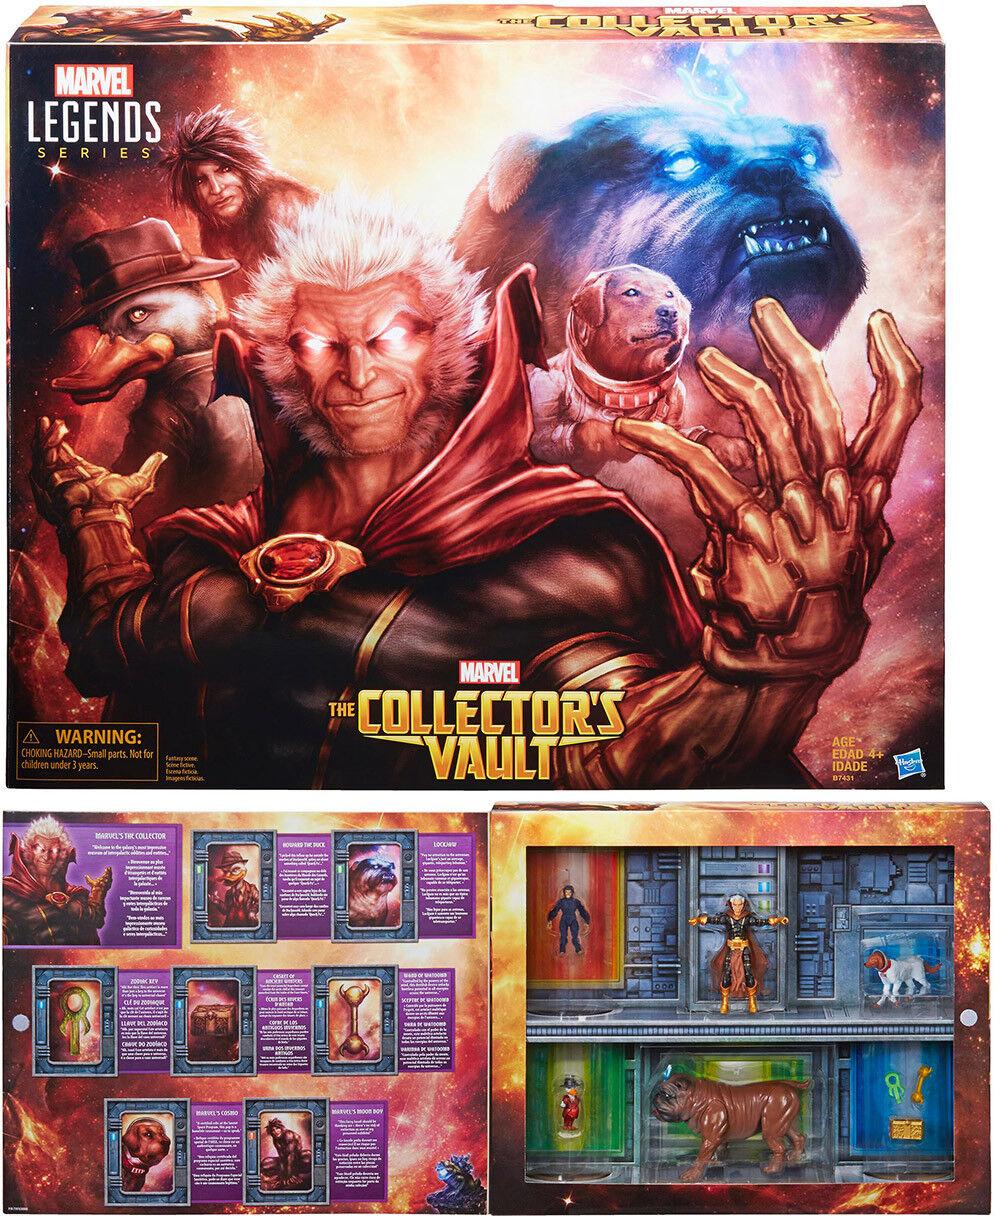 Marvel Universe Legends Figure Collector Set - The Collectors Vault SDCC 2016